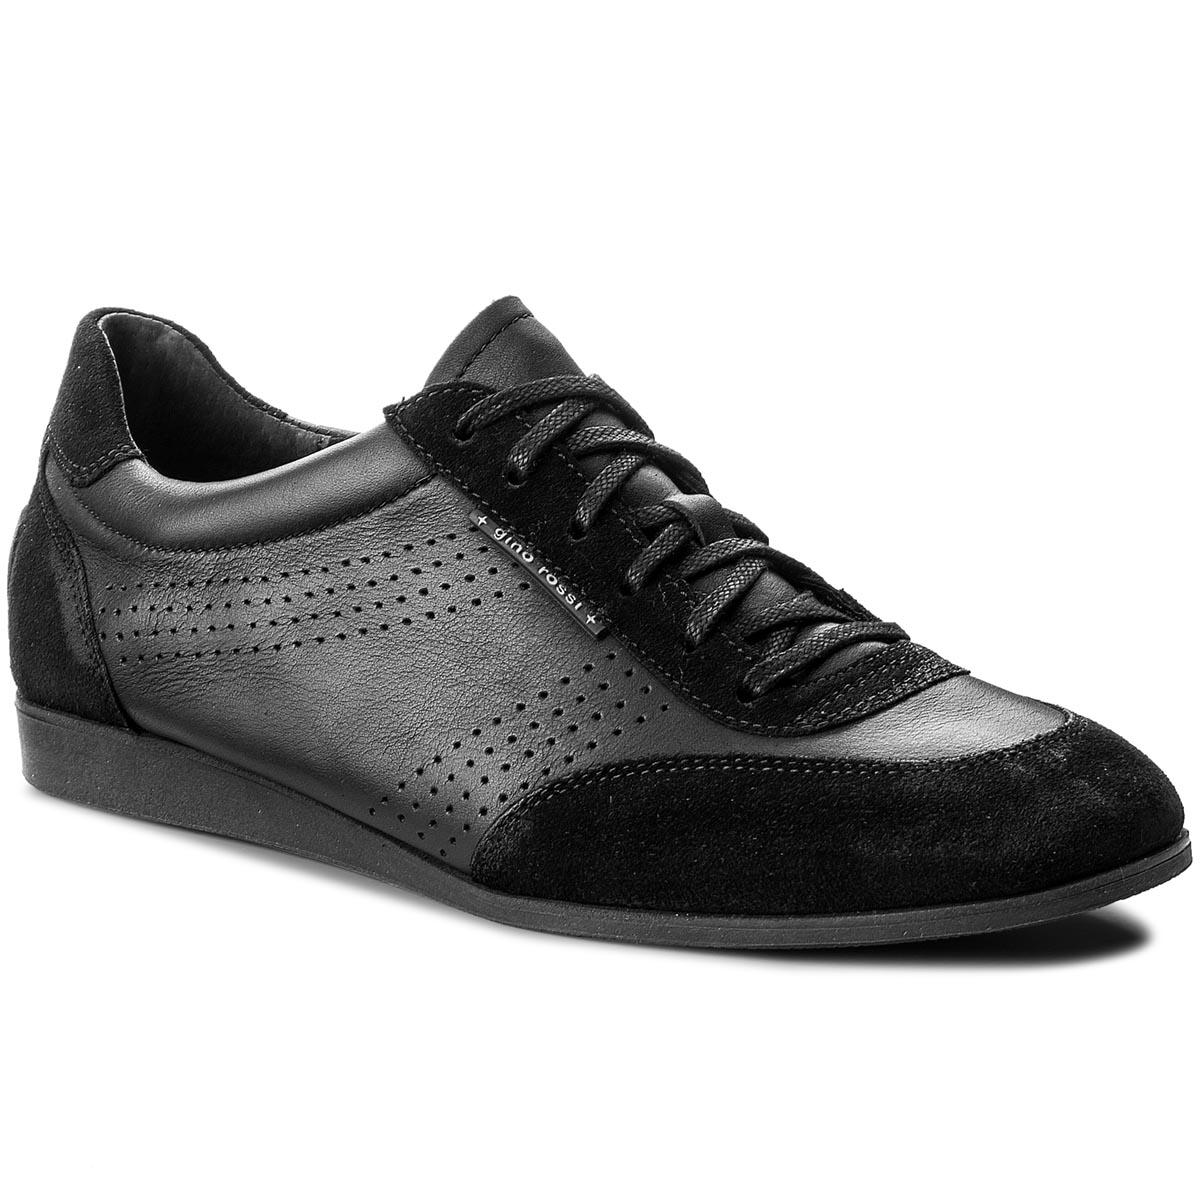 Alan Shoes Mpv491 9096 Rossi Gino 157 F 0284 R5xb FlKcJT1